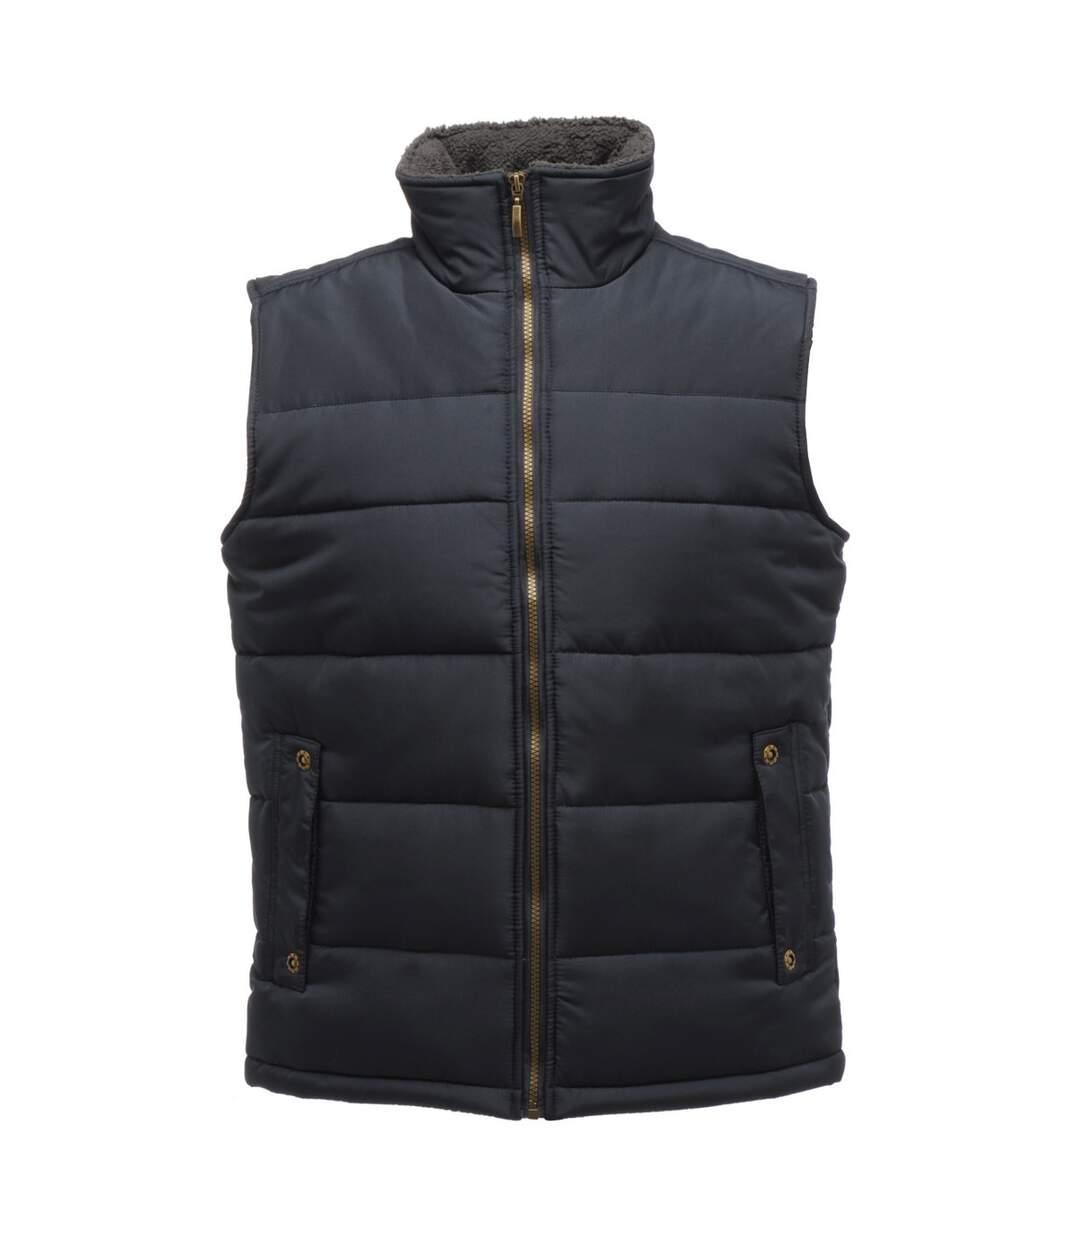 Regatta Mens Standout Altoona Insulated Bodywarmer Jacket (Navy) - UTRG1619